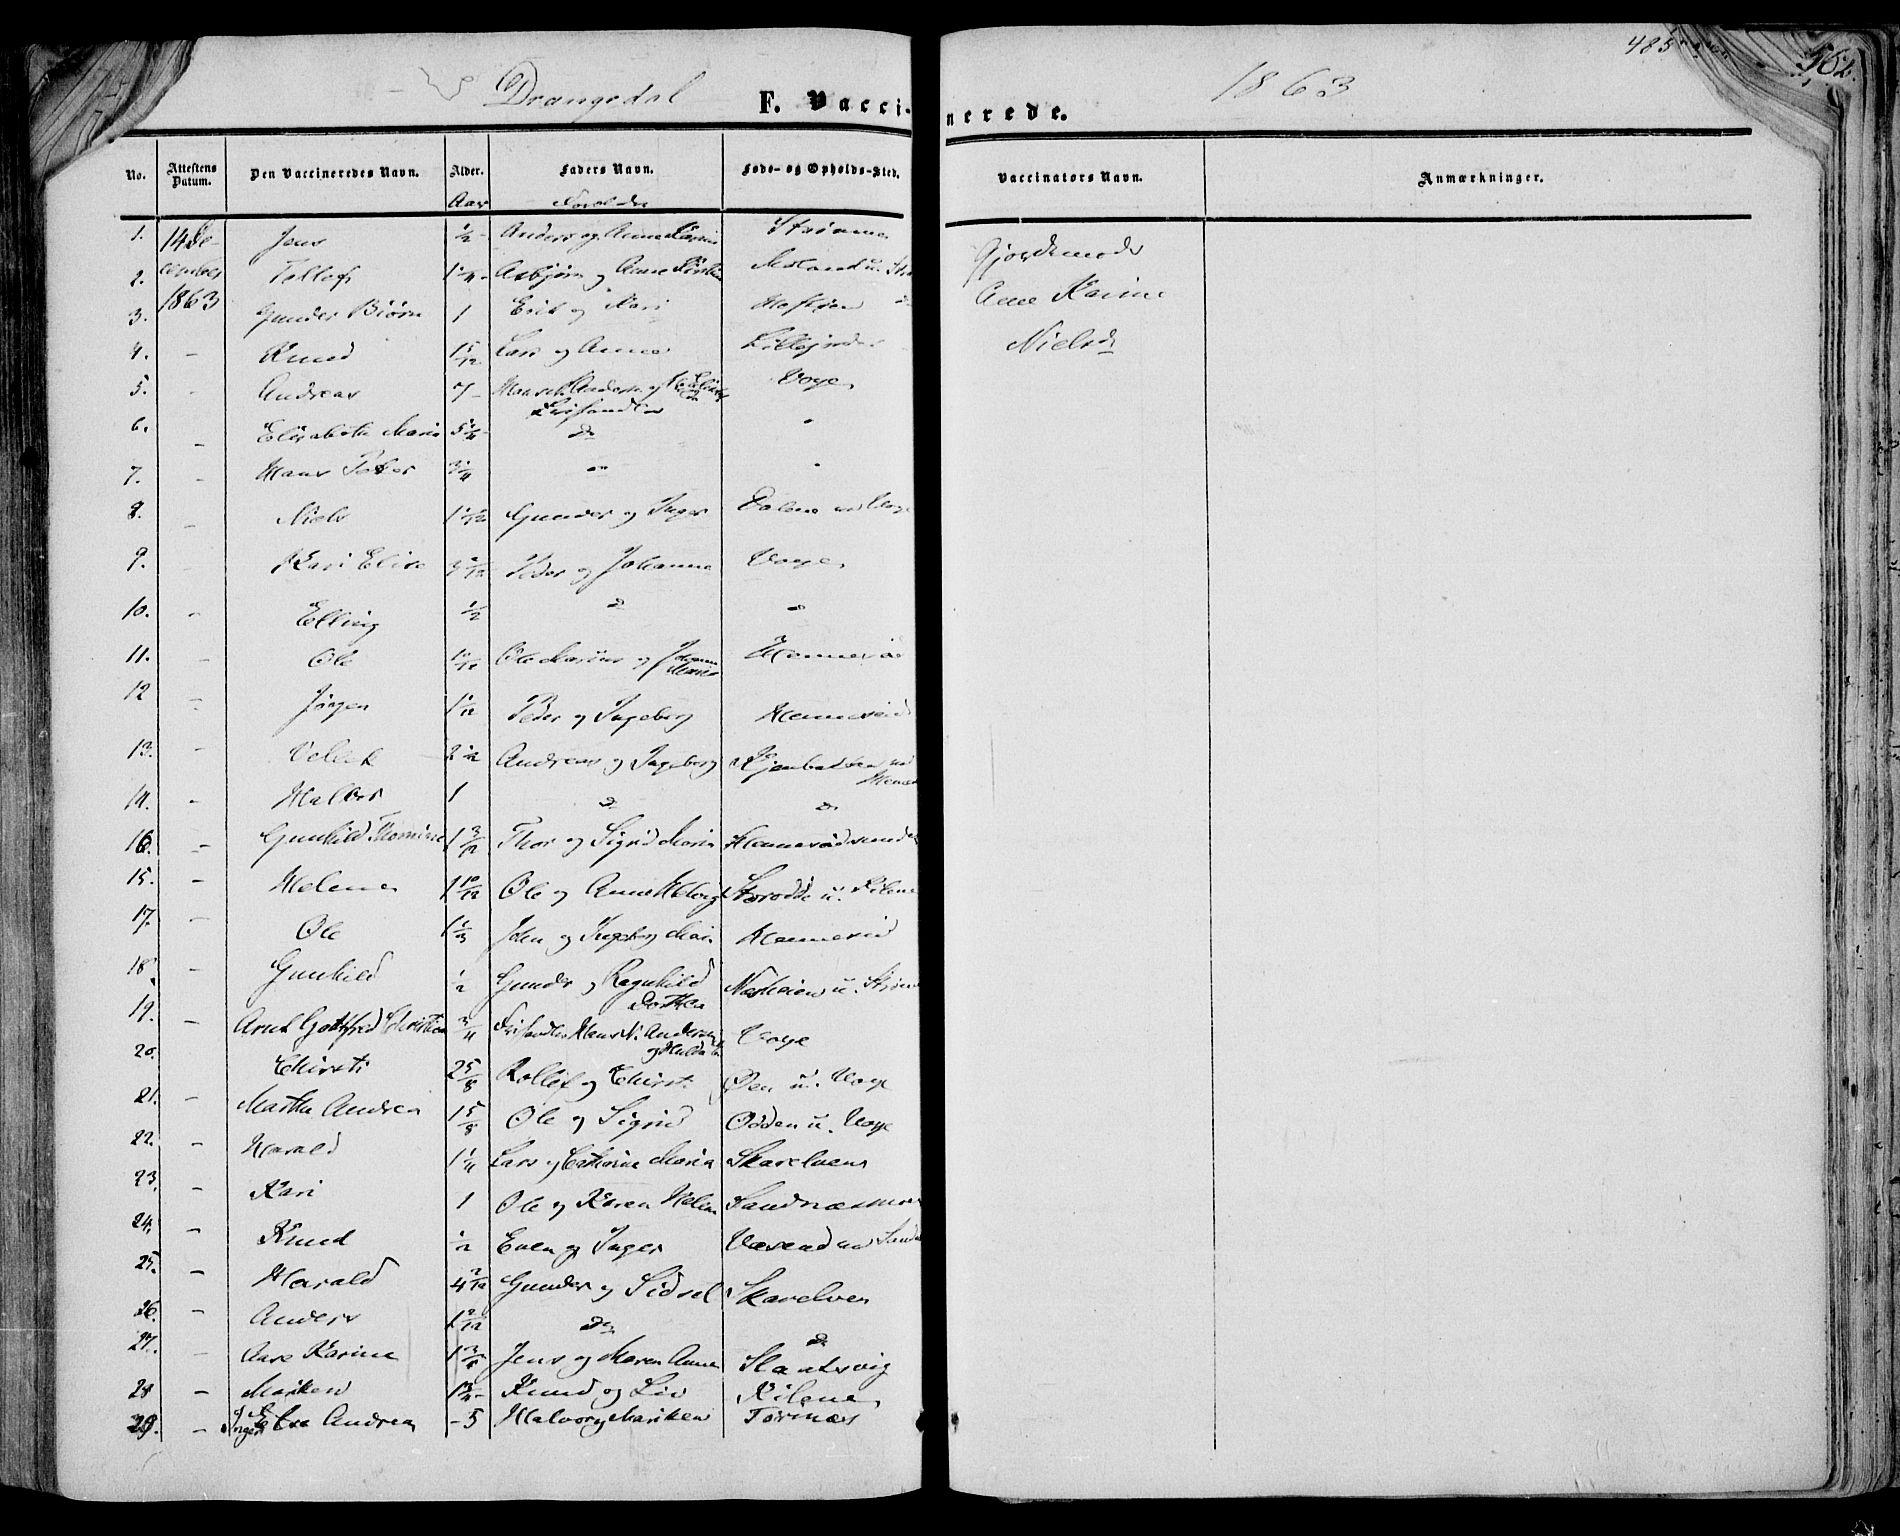 SAKO, Drangedal kirkebøker, F/Fa/L0008: Ministerialbok nr. 8, 1857-1871, s. 485